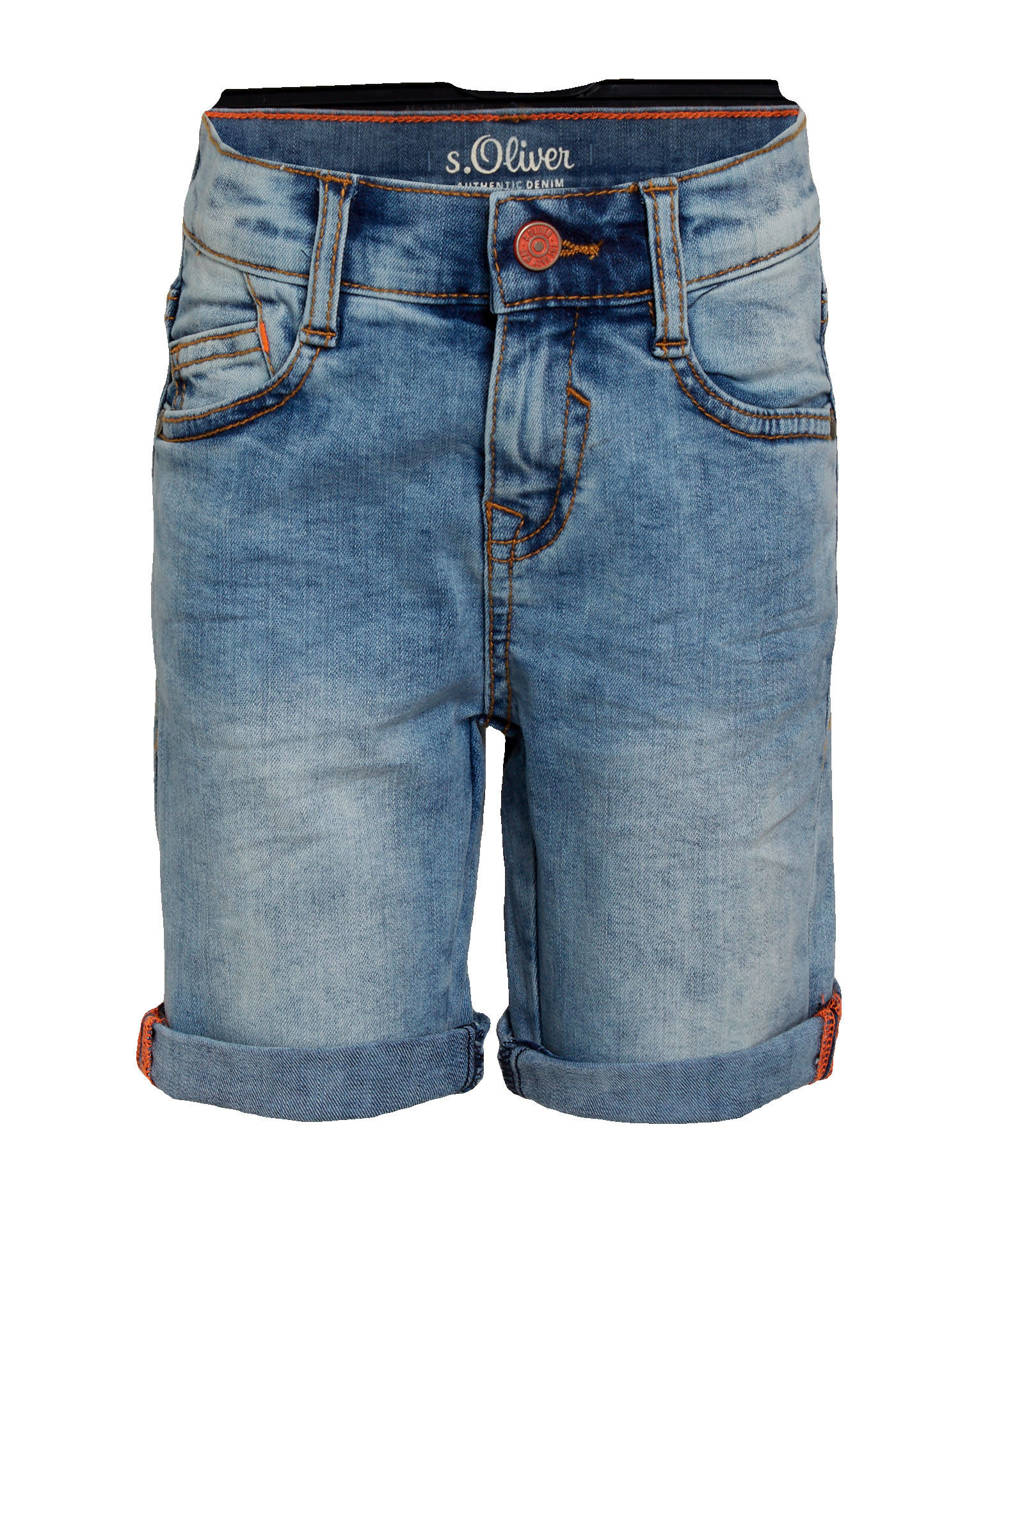 s.Oliver jeans bermuda blauw, Blauw